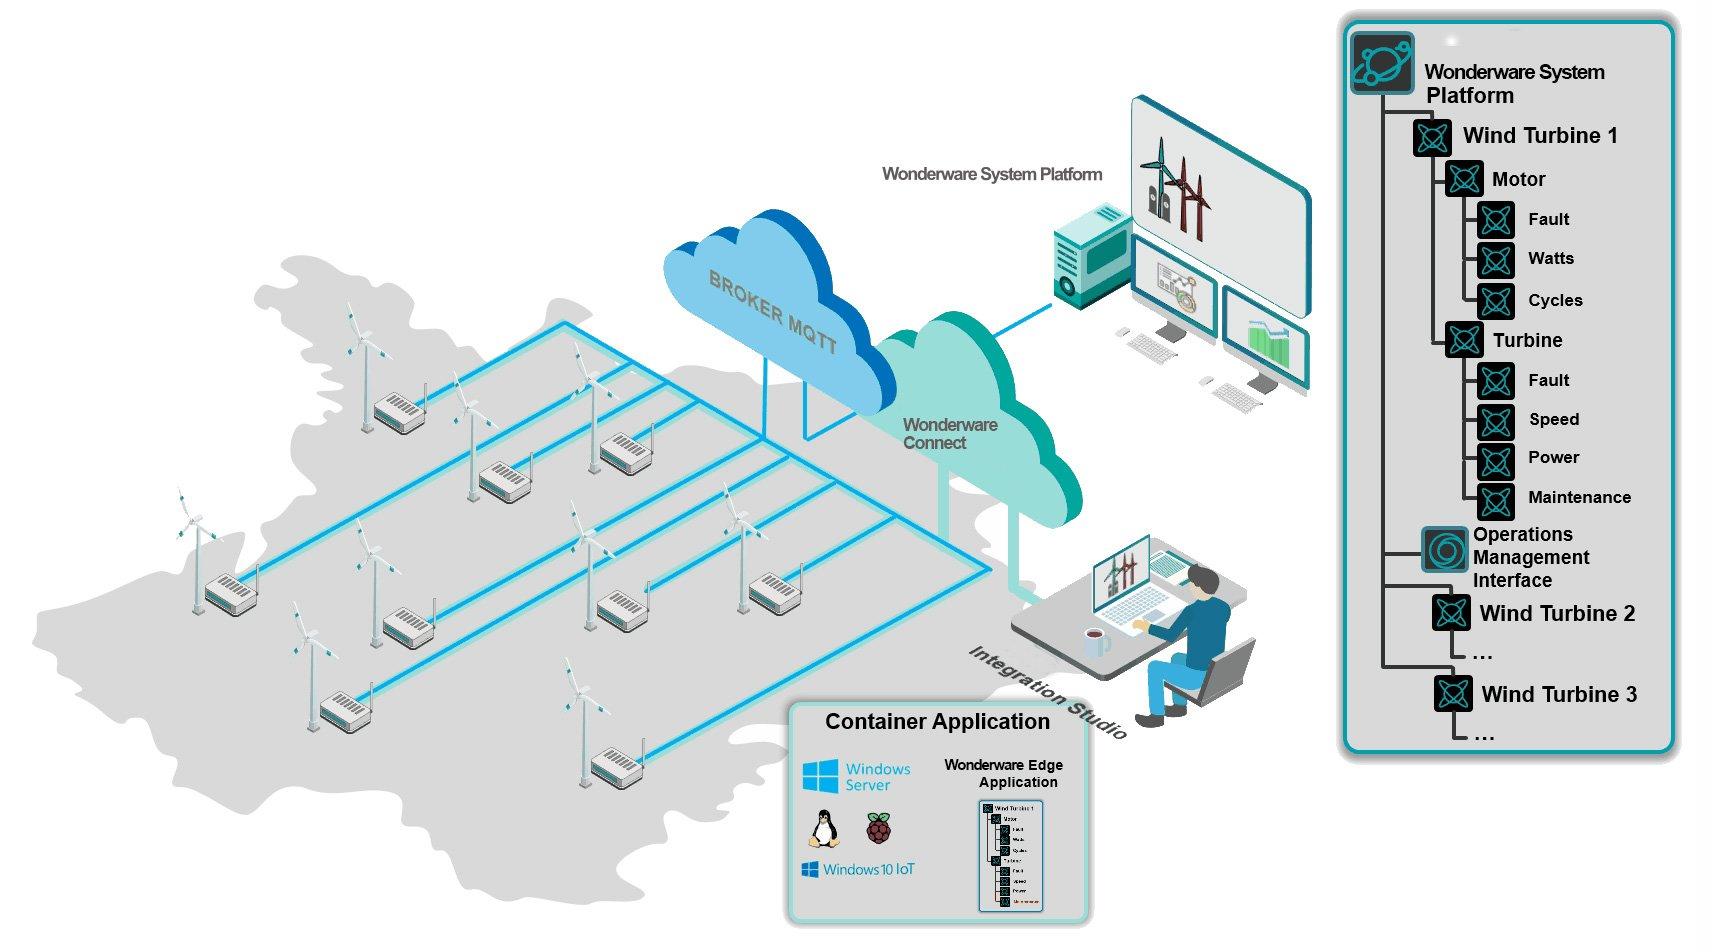 wonderware system-platform edge computiung